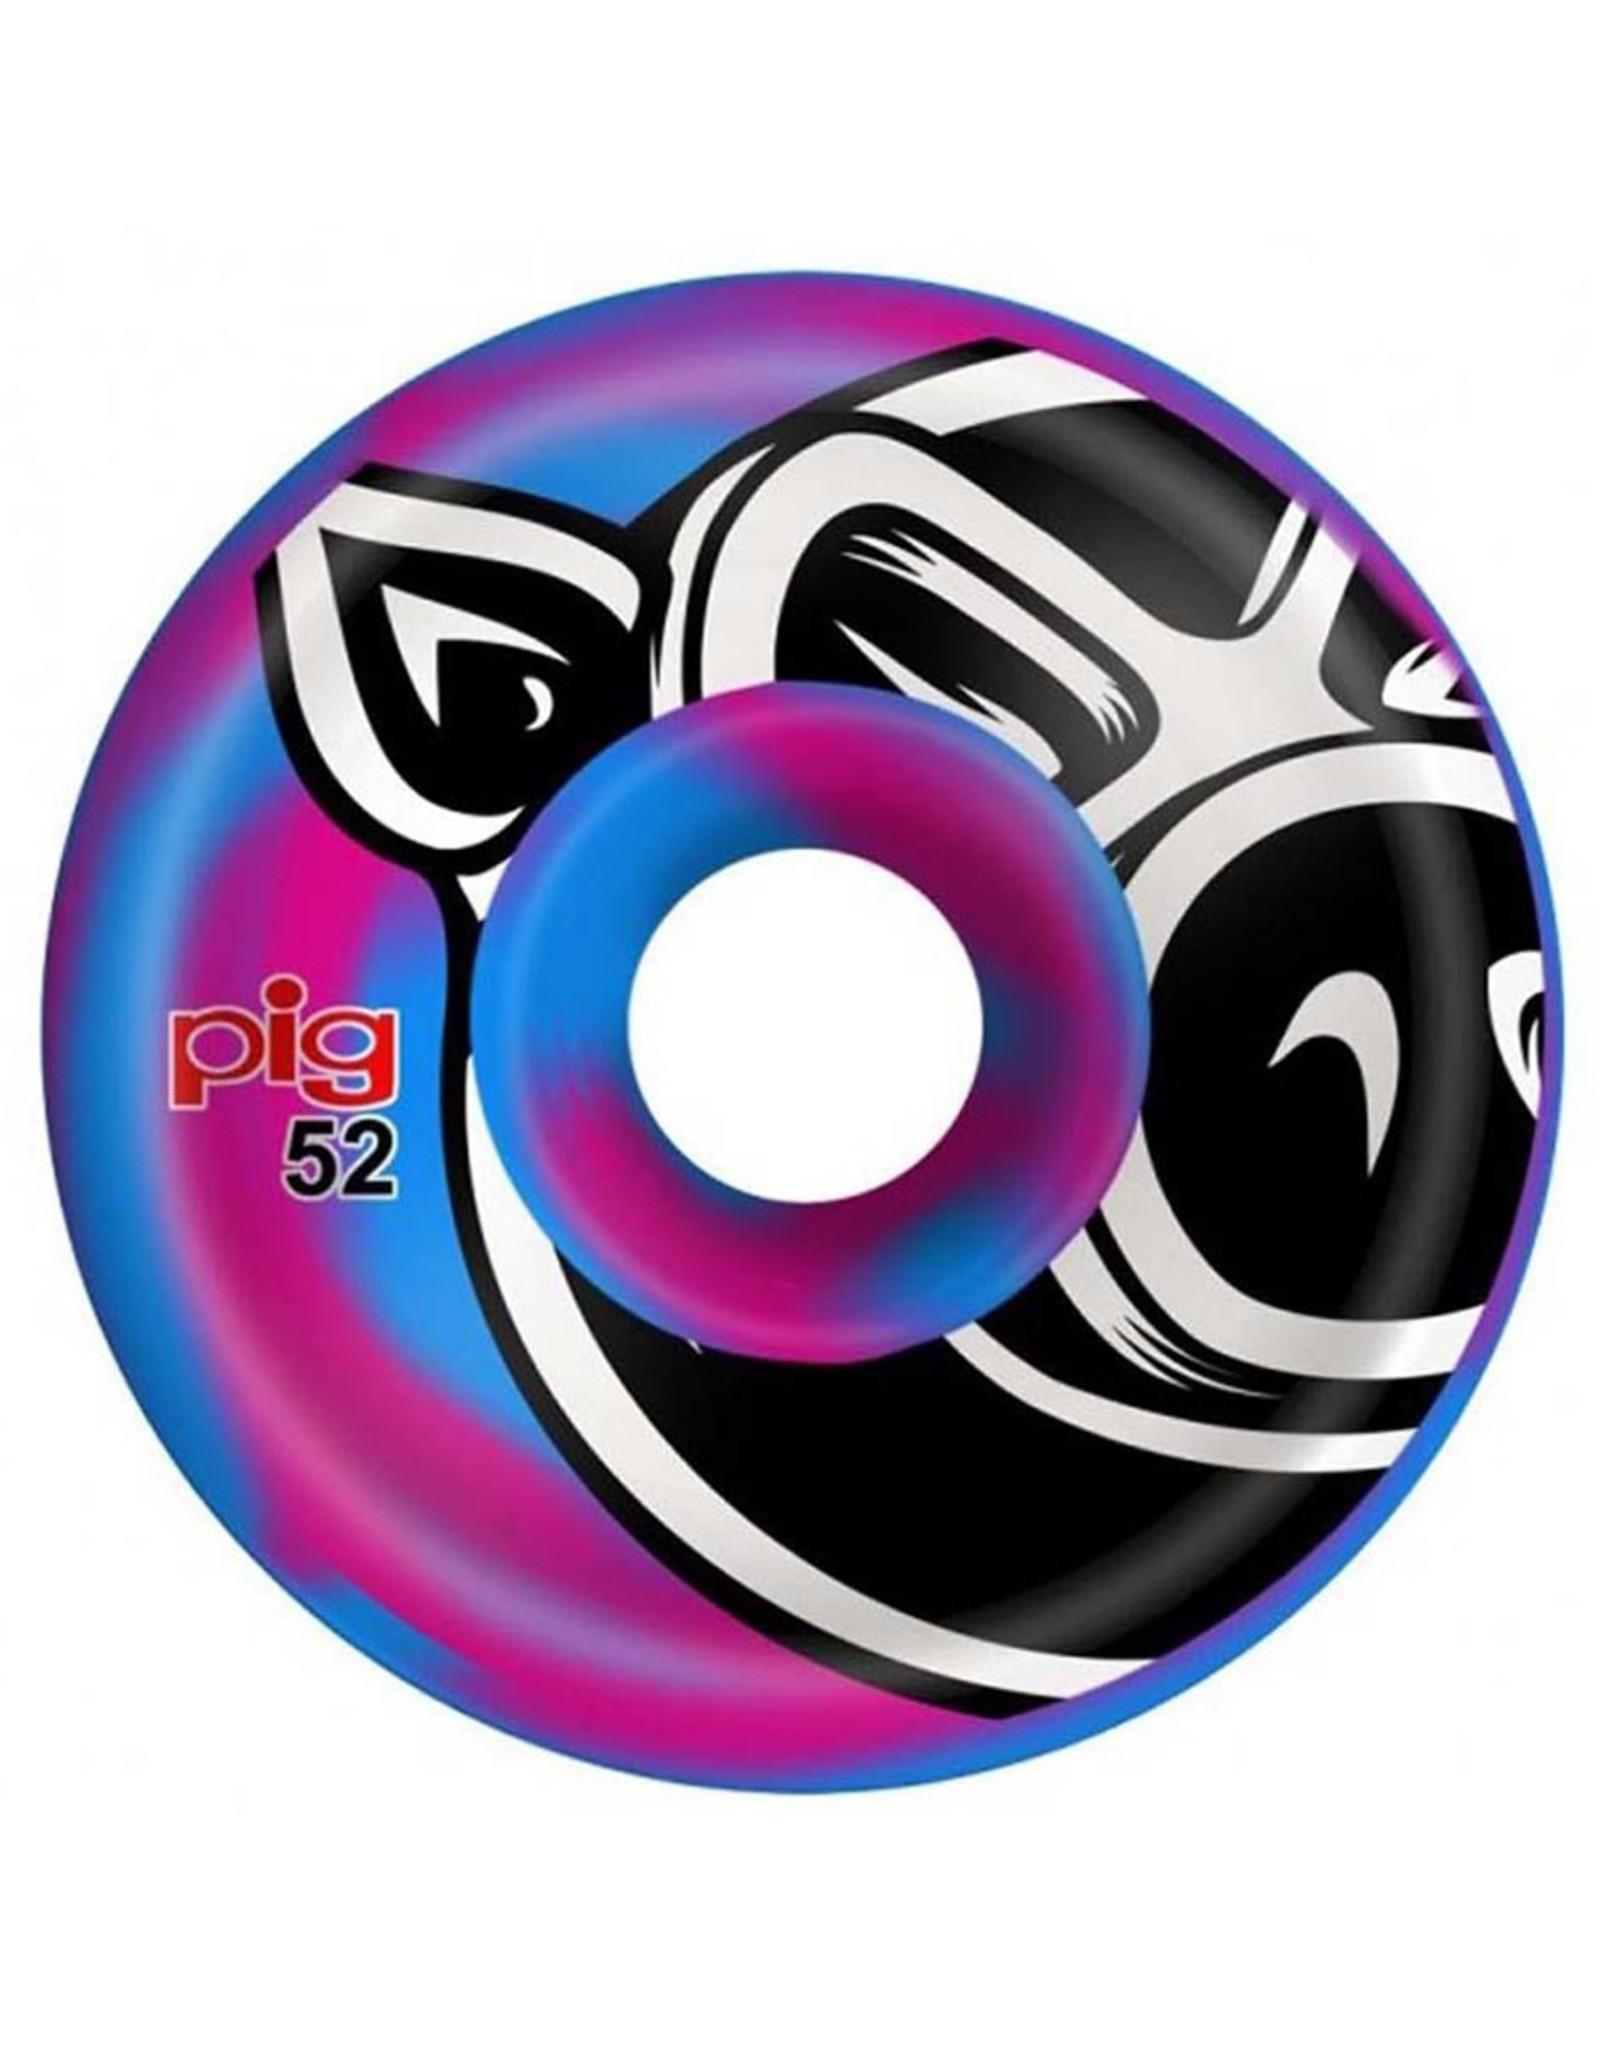 Pig Pig Wheels Head C-Line Blue/Pink Swirl (52mm)